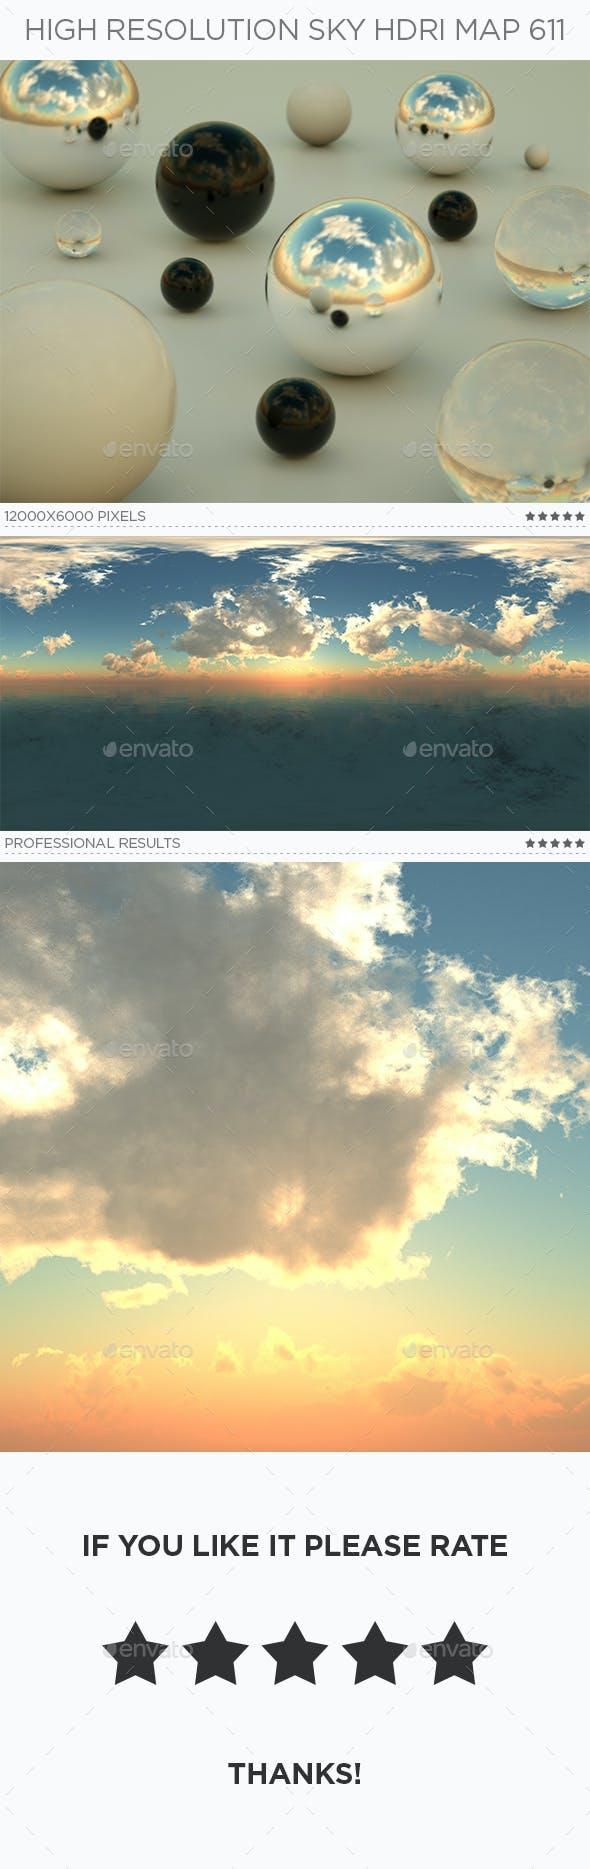 High Resolution Sky HDRi Map 611 - 3DOcean Item for Sale